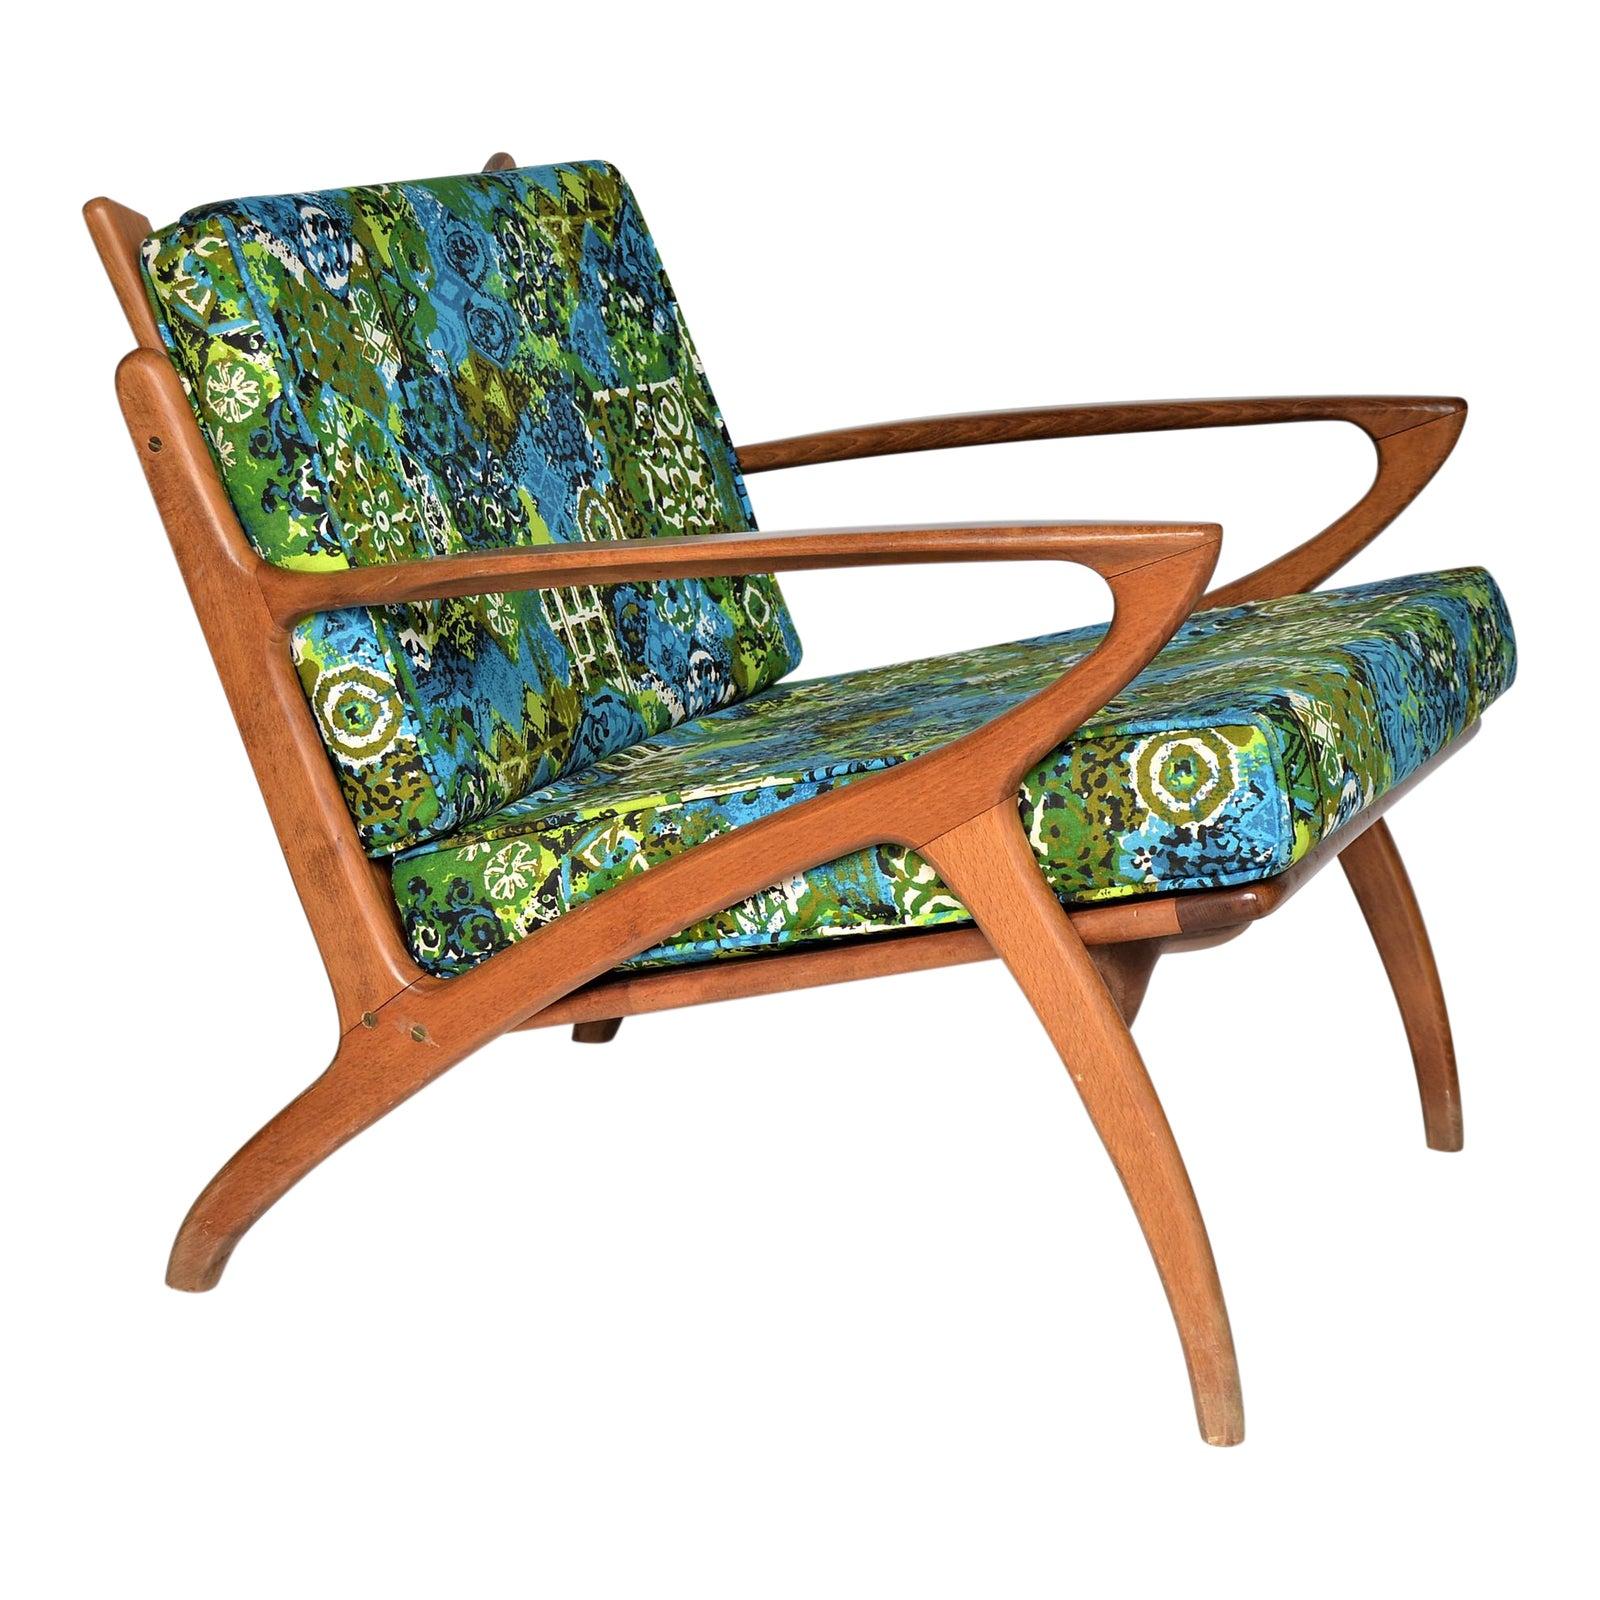 Mid Century Danish Modern Solid Teak Selig Style Lounge Chair Mcm Tropical Coastal Boho Chic Haute Bohemian Chairish